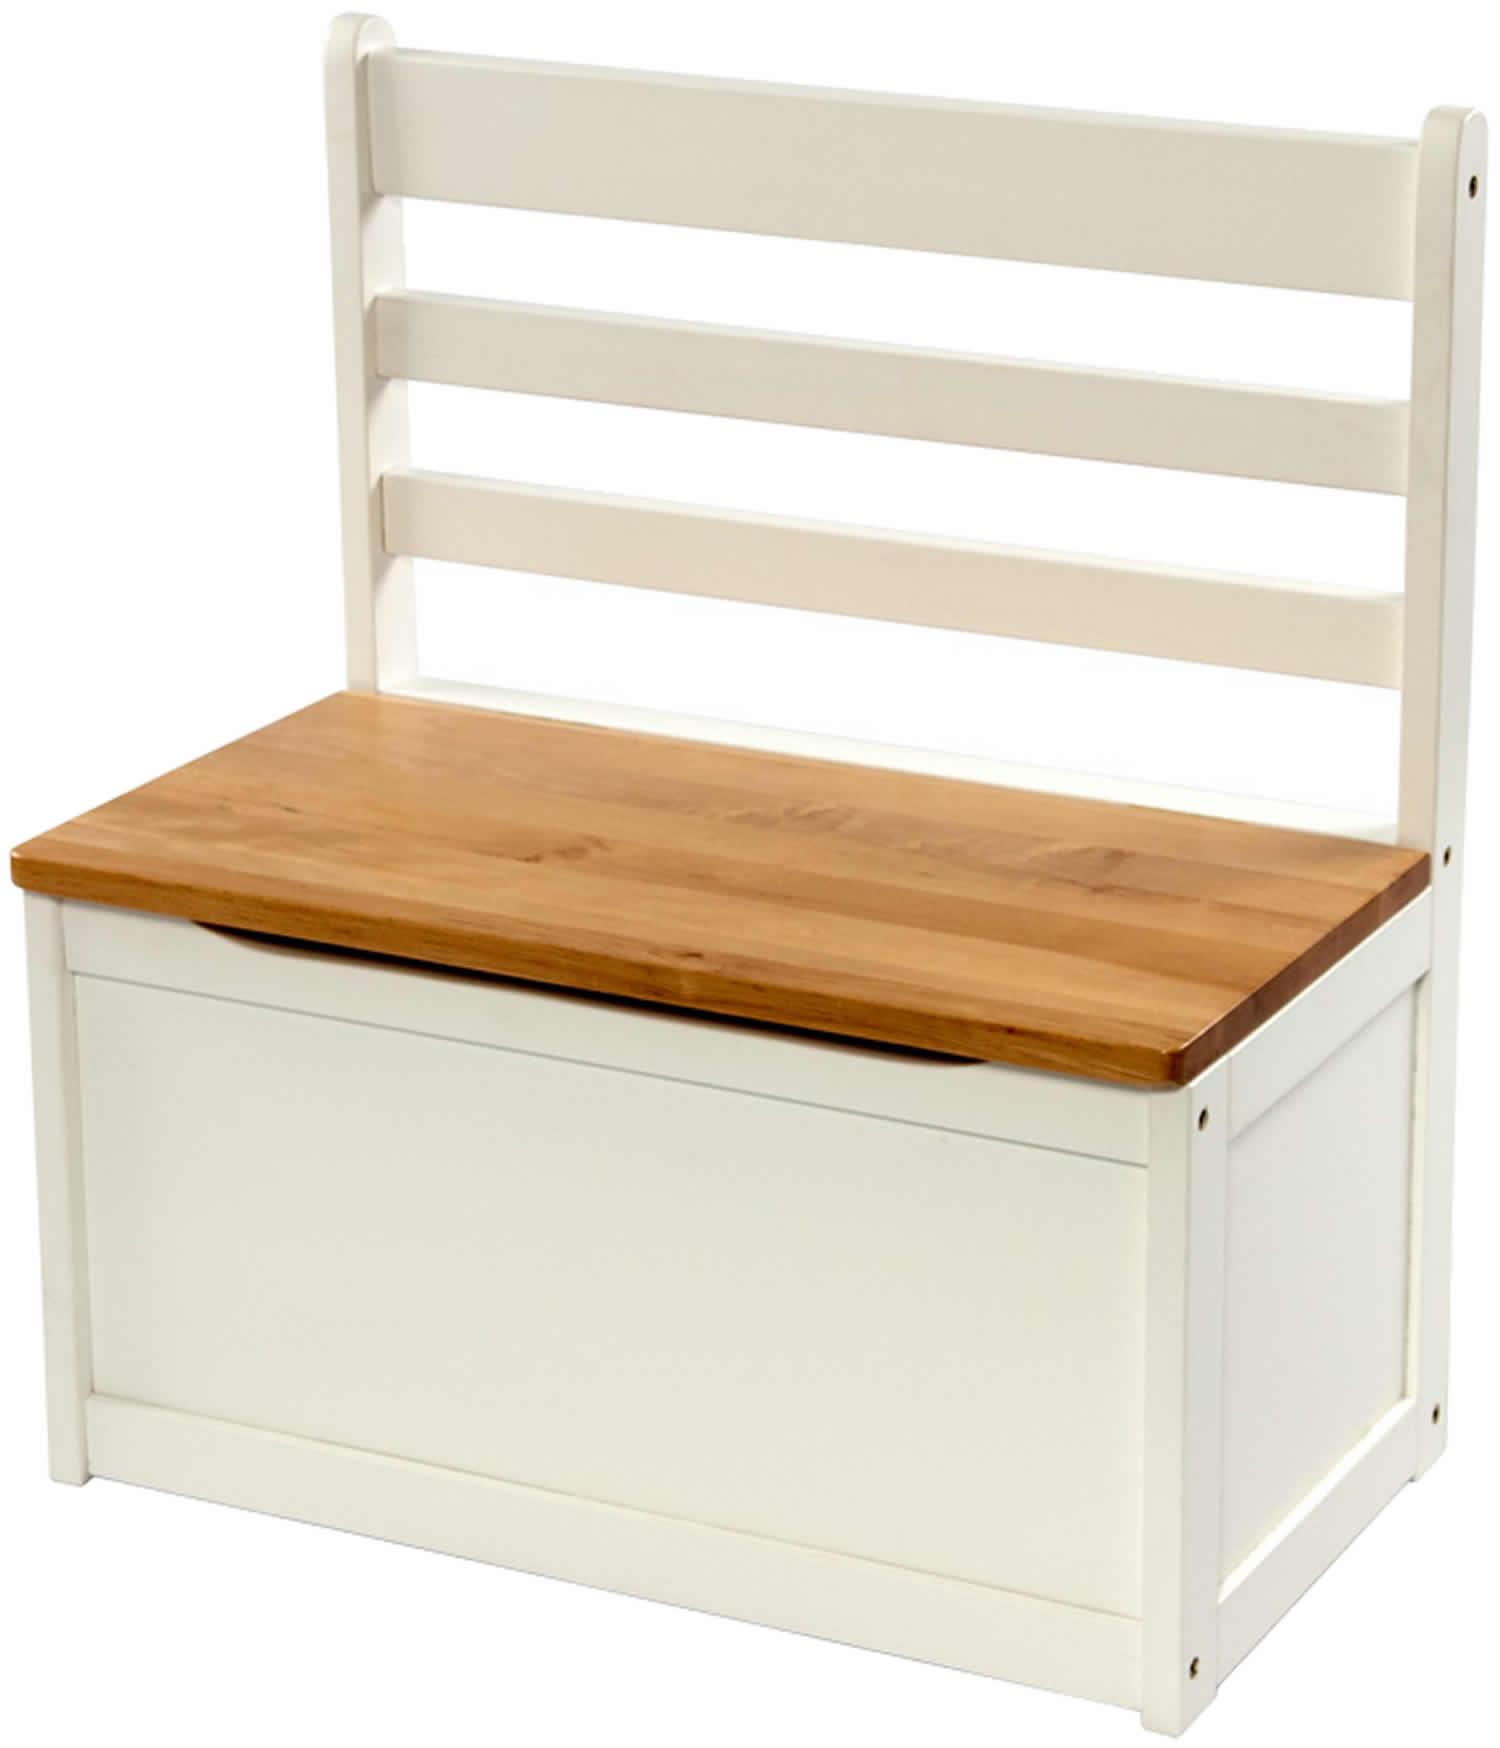 Kinder Sitzbank Holzbank Truhenbank Truhe Spielzeugbox | eBay